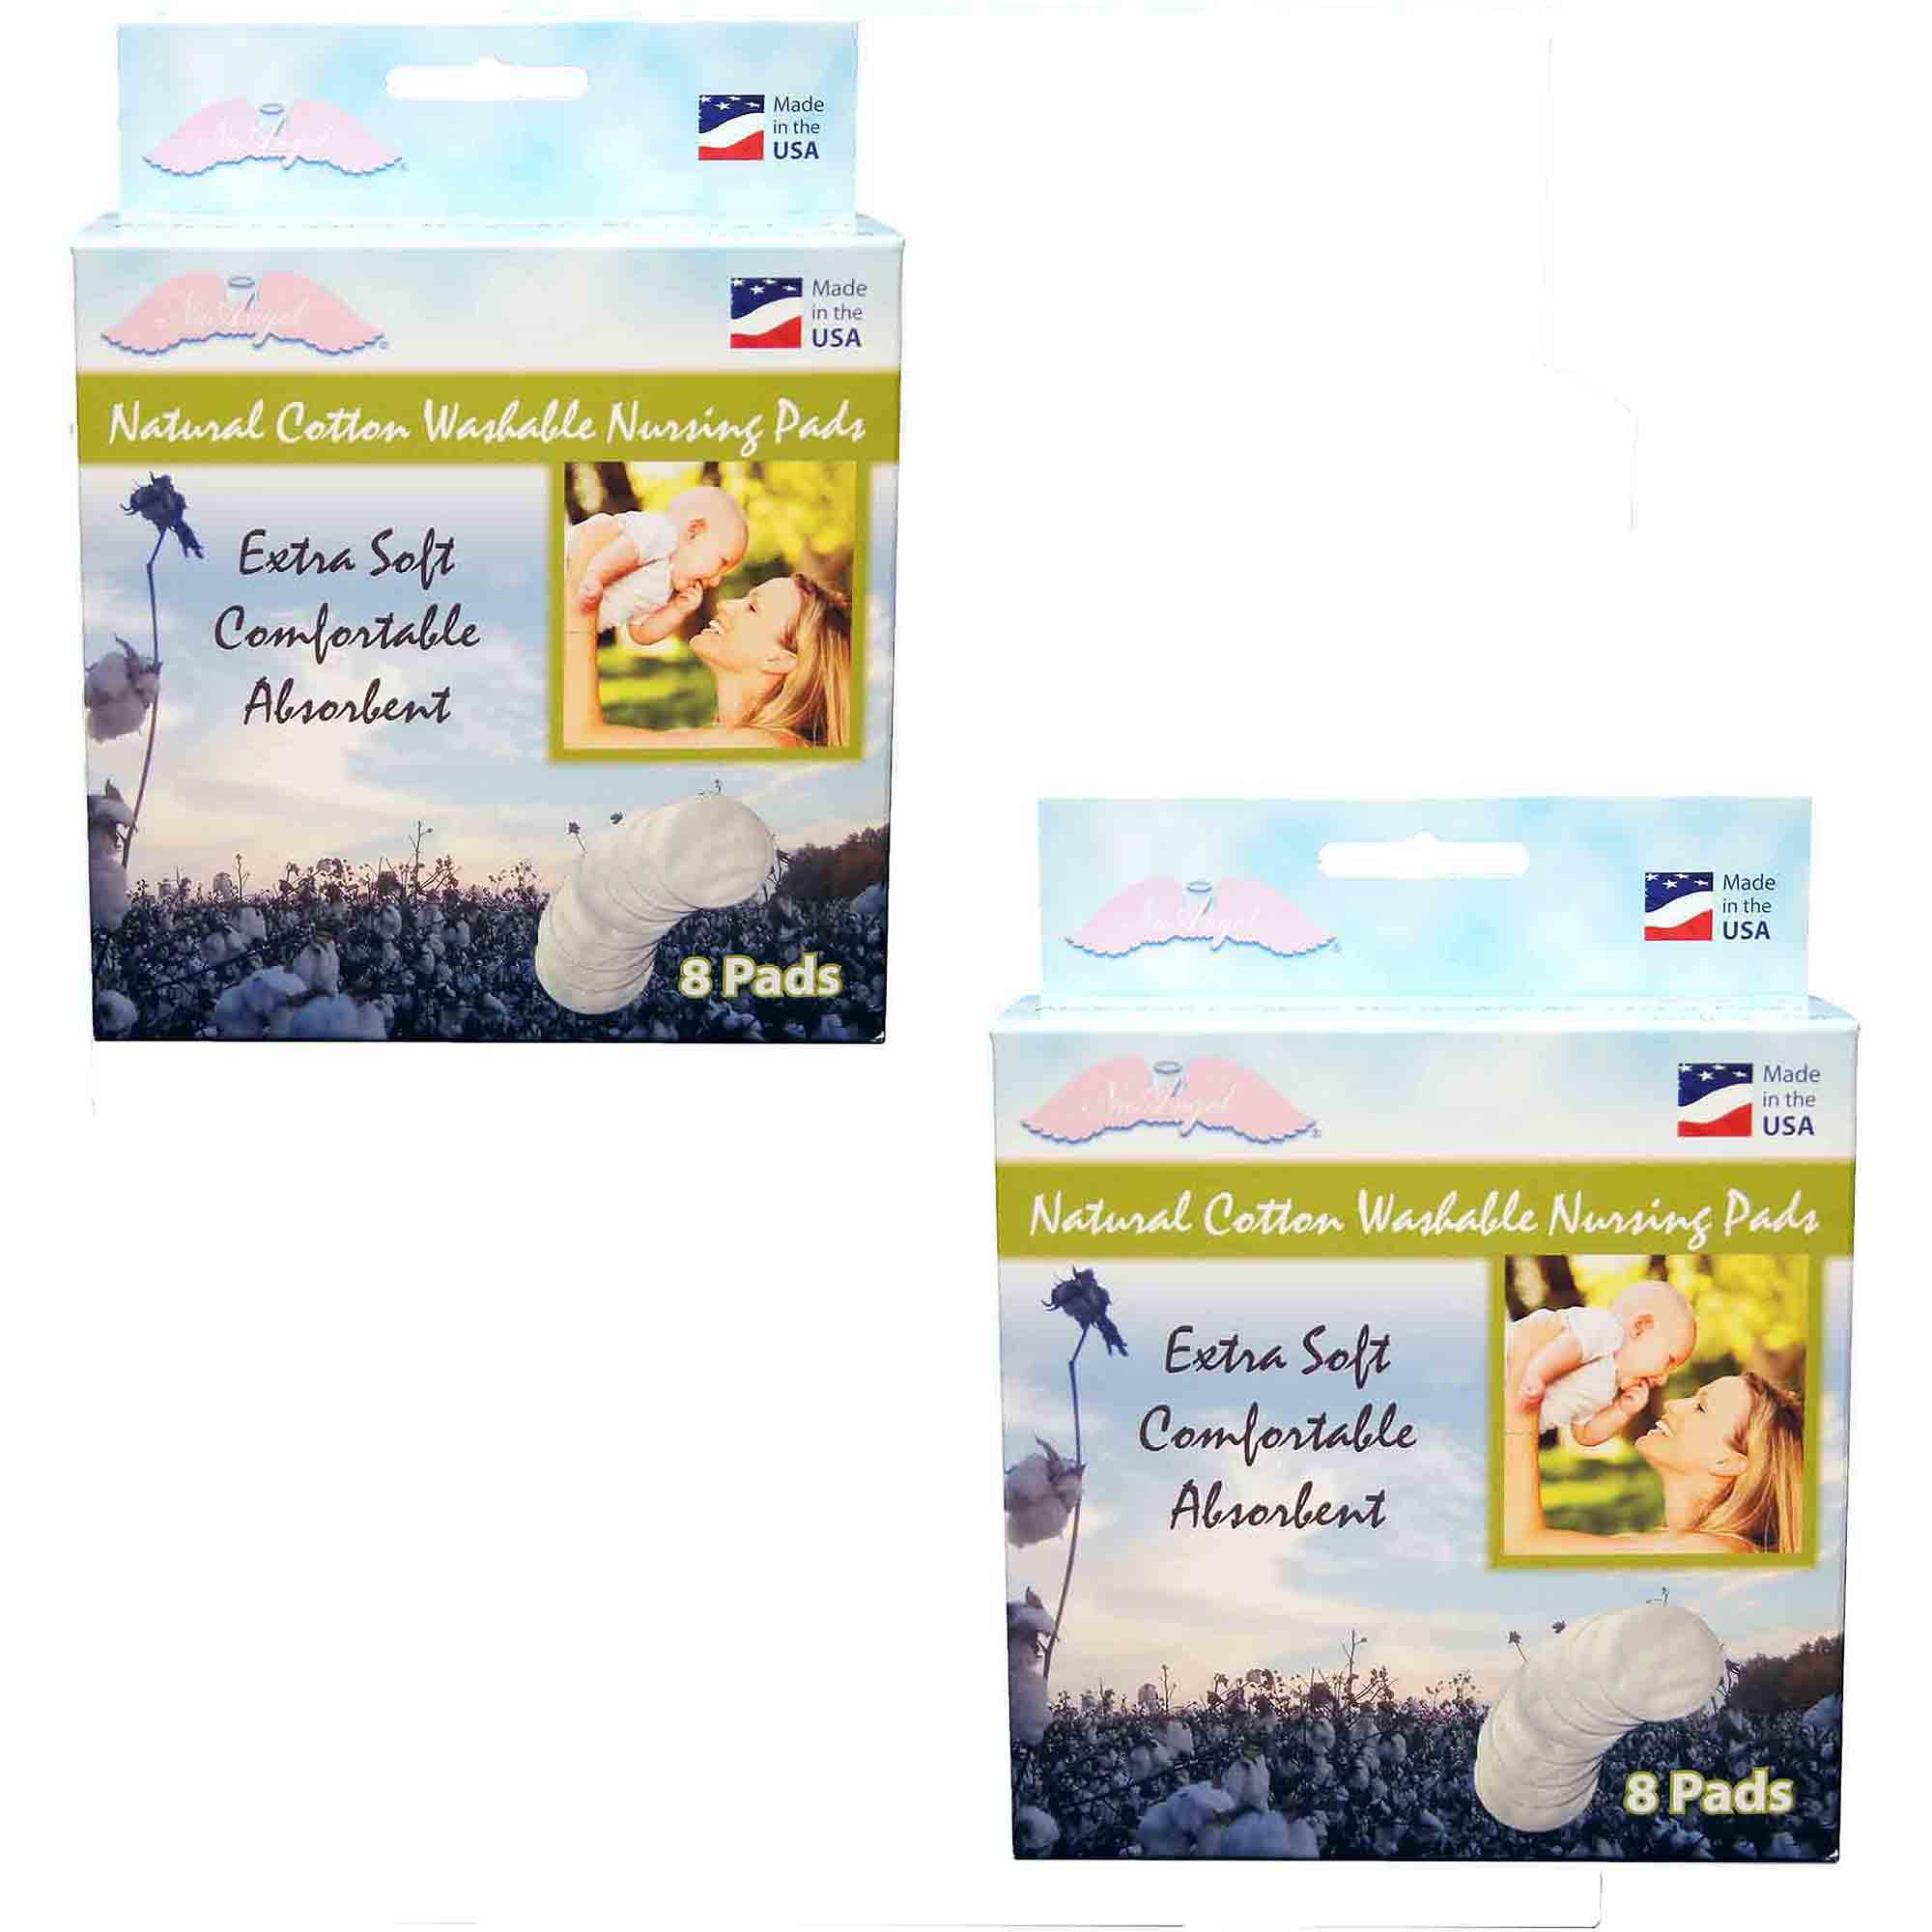 NuAngel All-Natural Cotton Washable Nursing Pads, White, 16ct